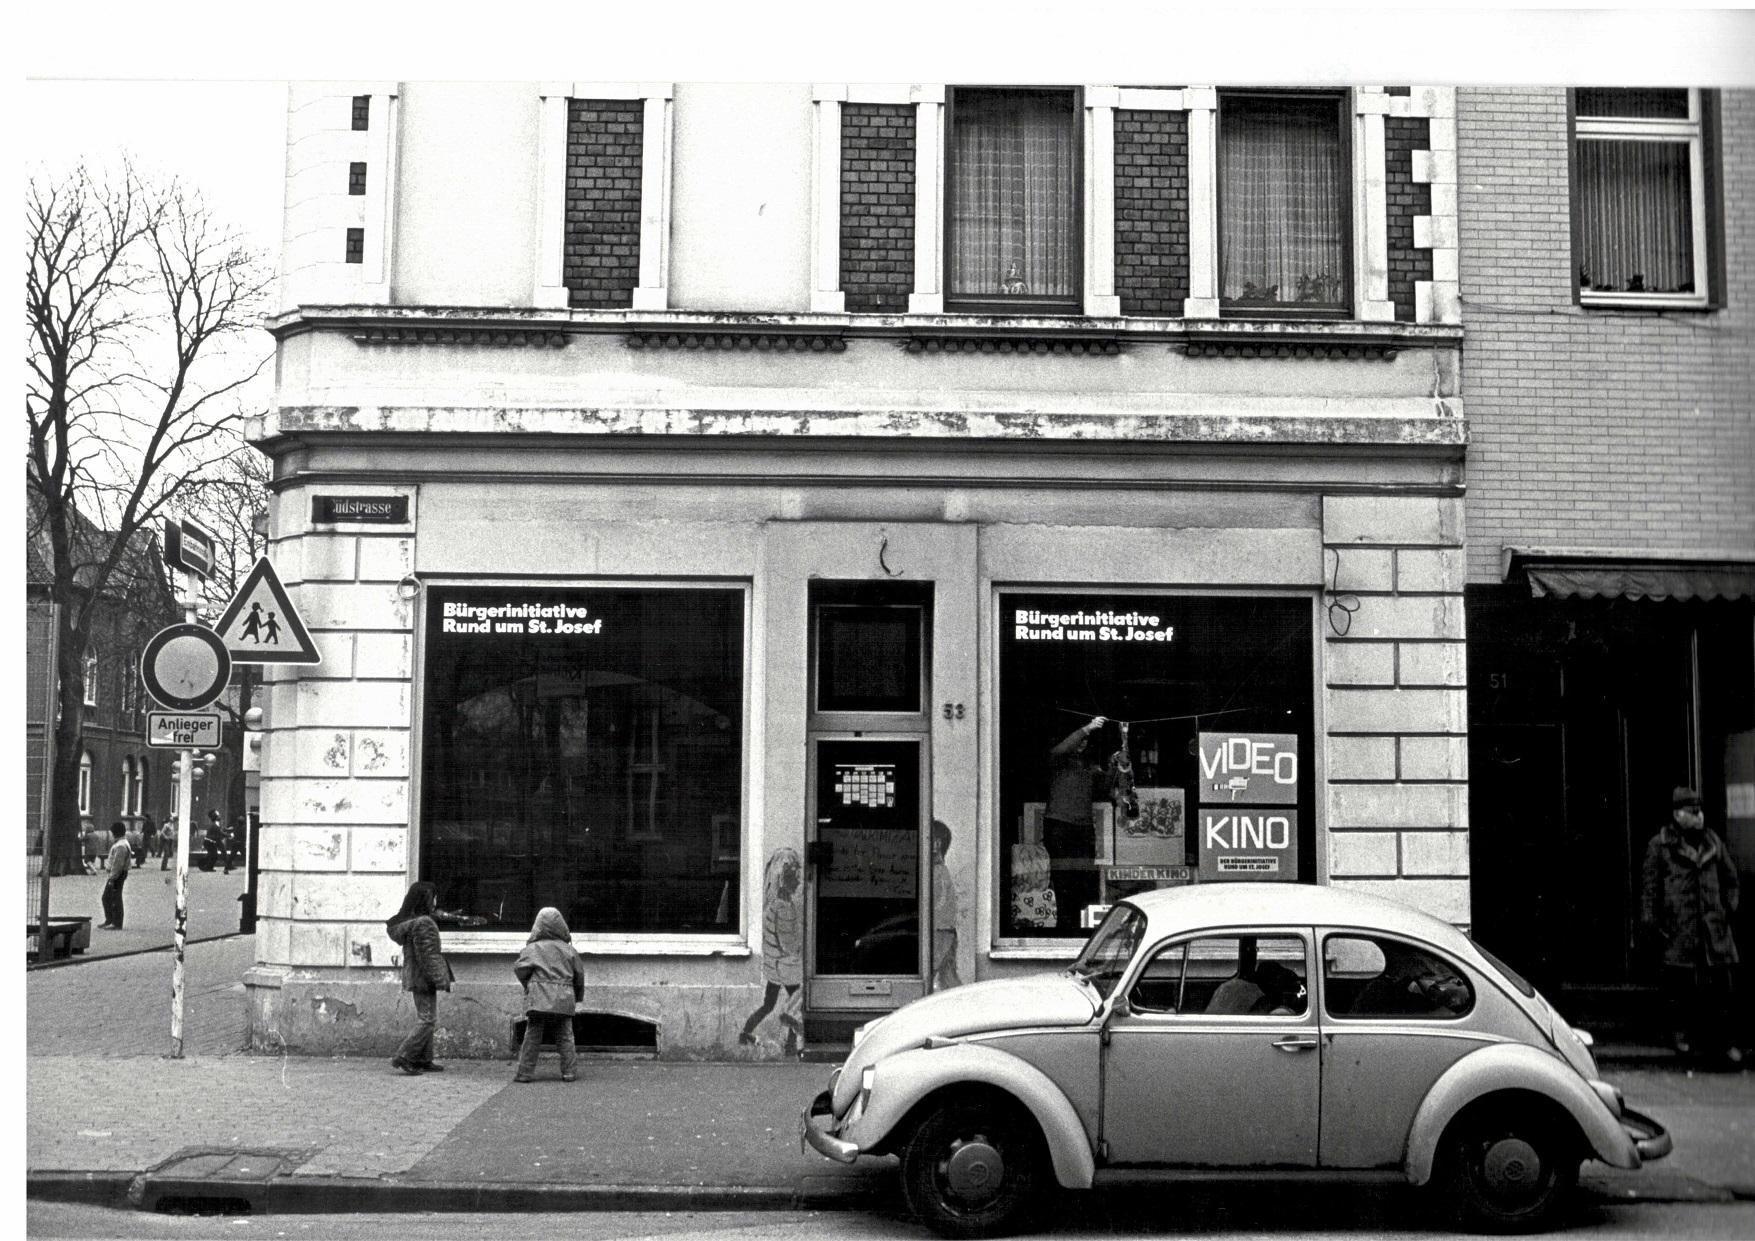 1979. Ladenlokal der BI